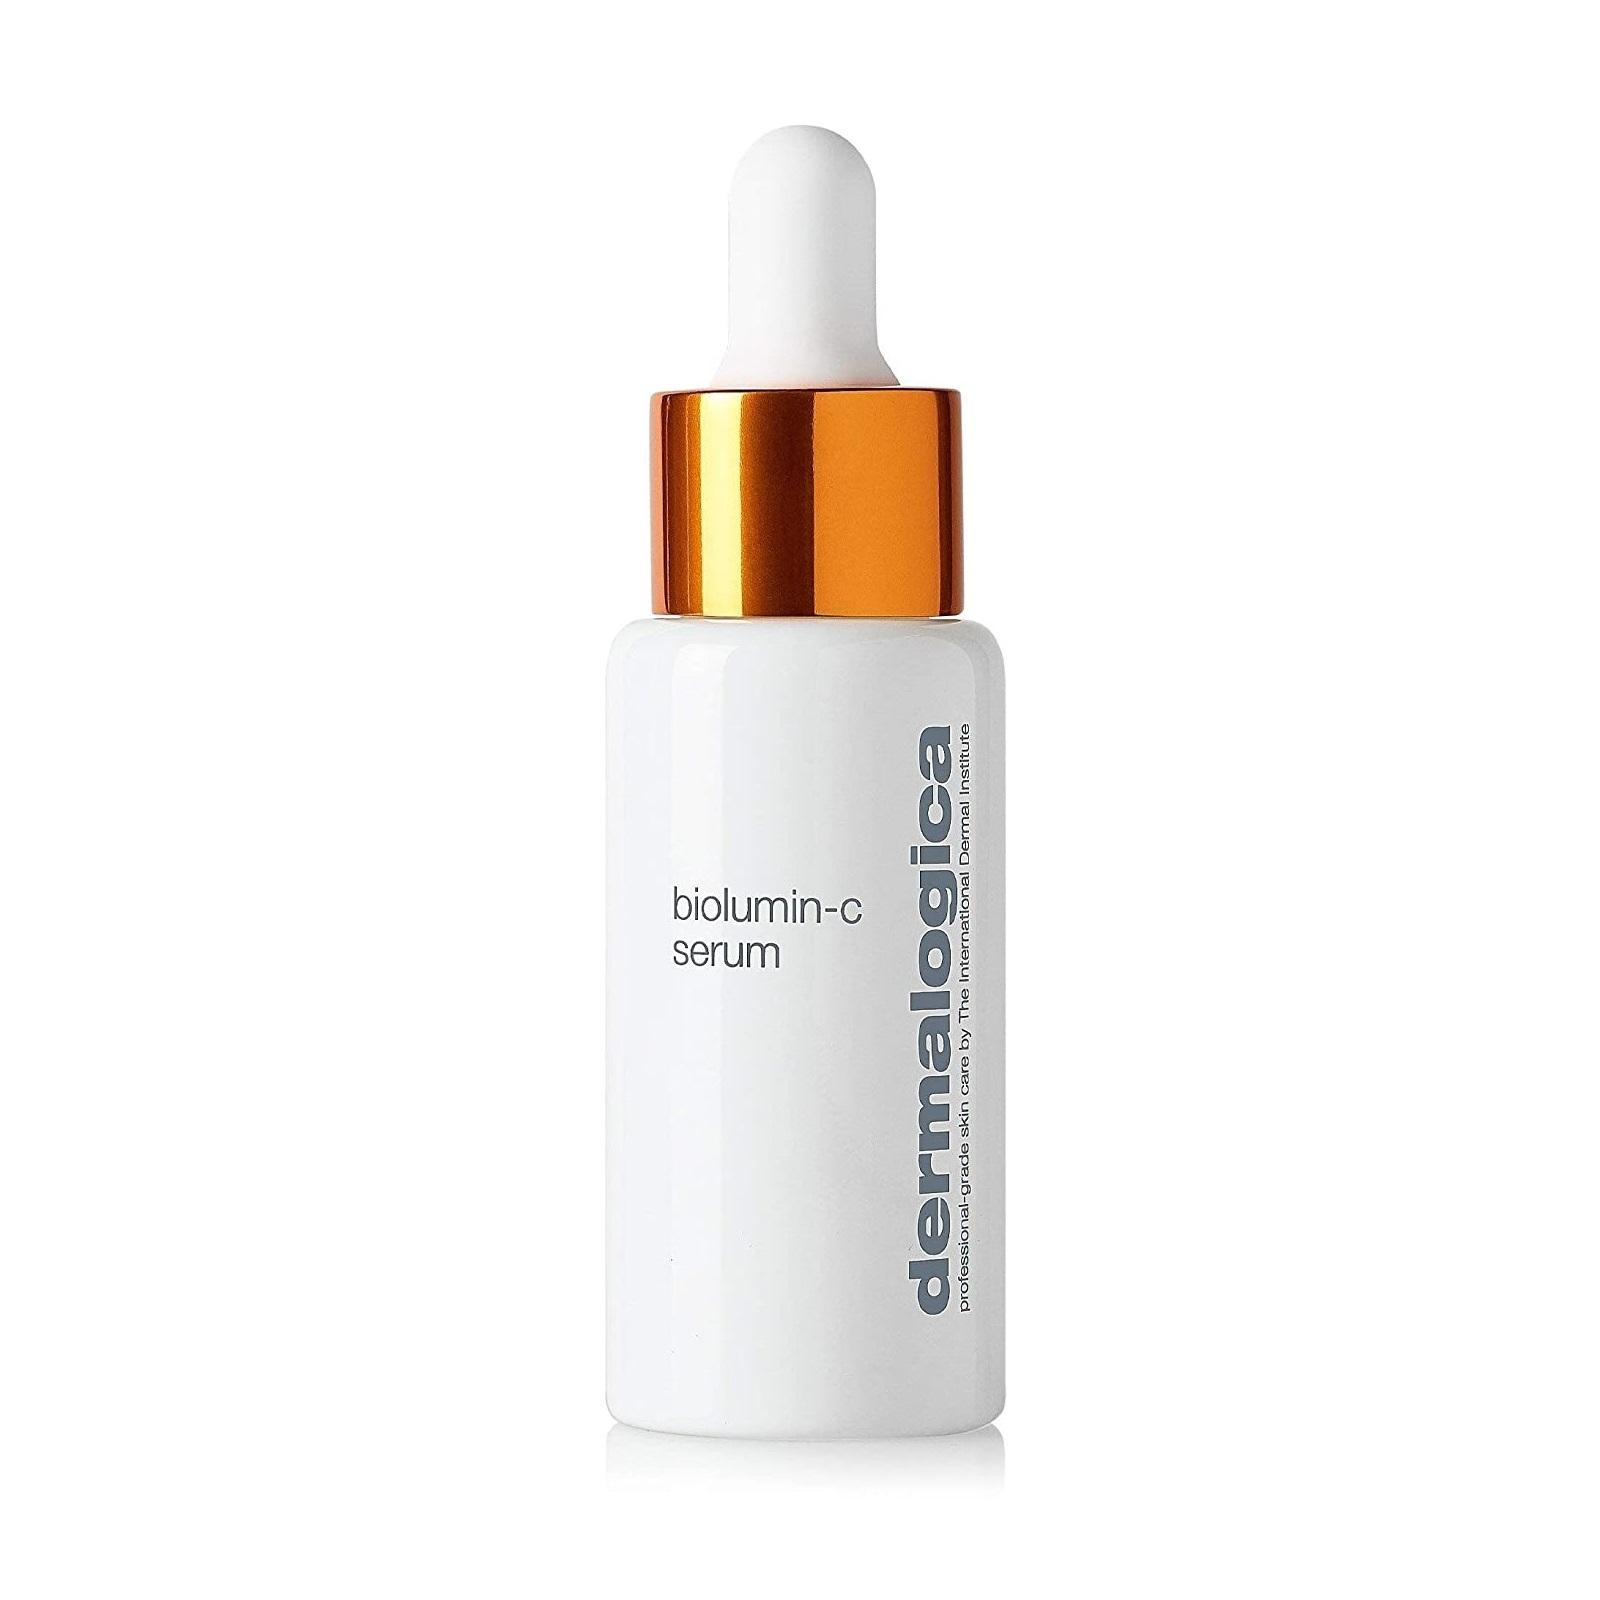 Dermalogica Сыворотка для лица с витамином С «Biolumin-С» 30 мл фото